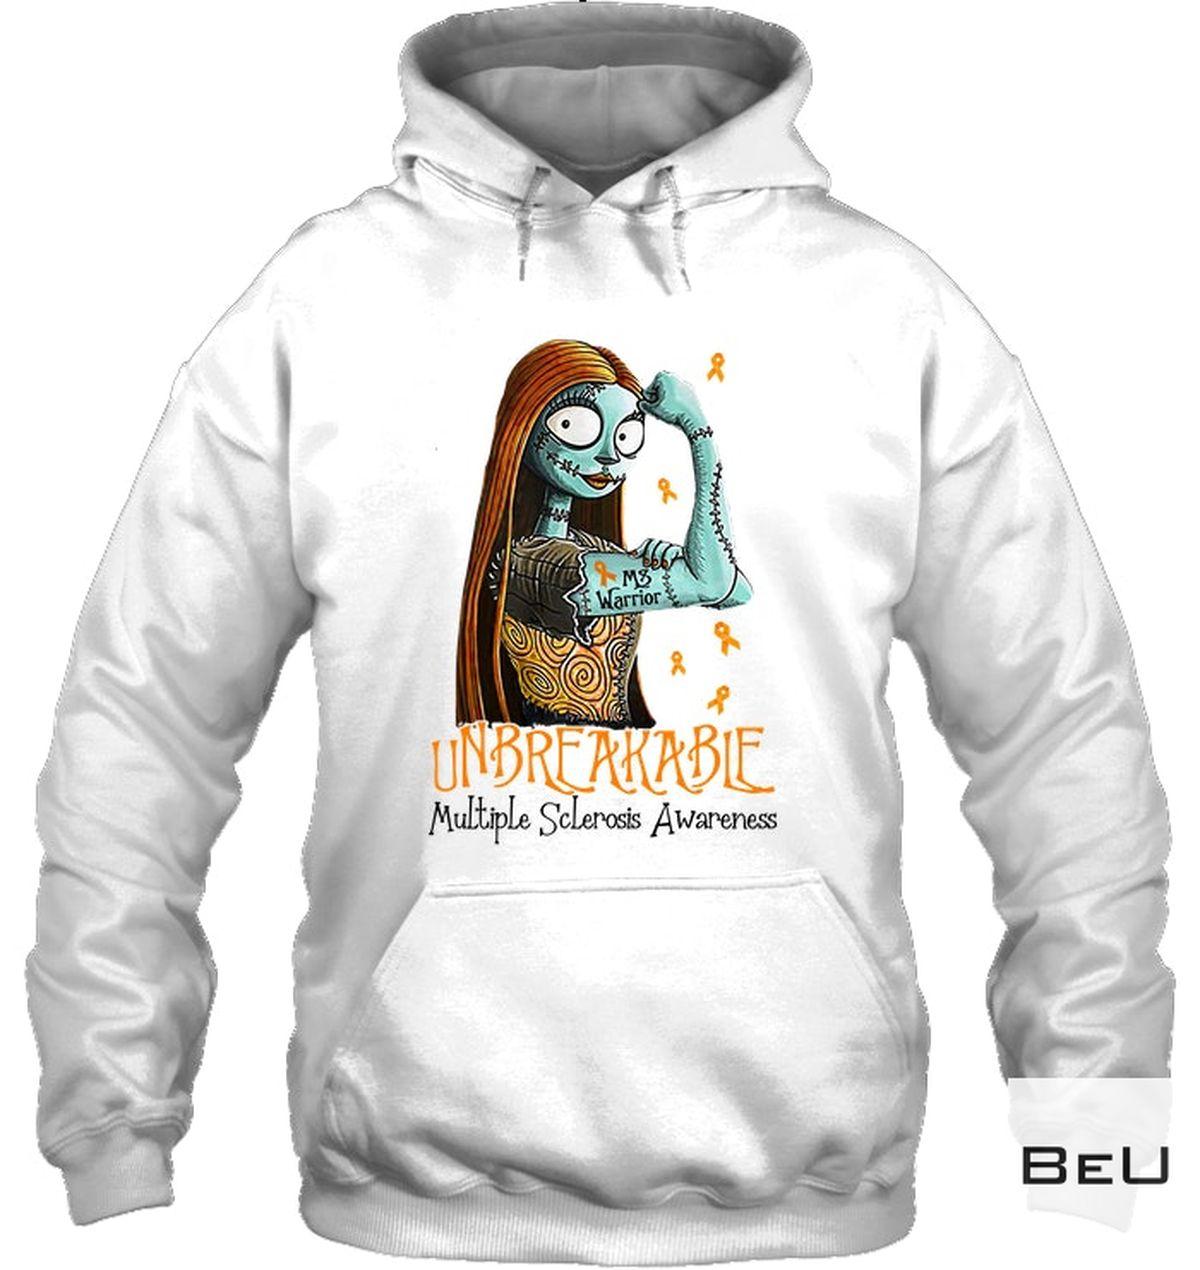 Popular Sally Unbreakable Multiple Sclerosis Awareness Shirt, Hoodie, Tank Top